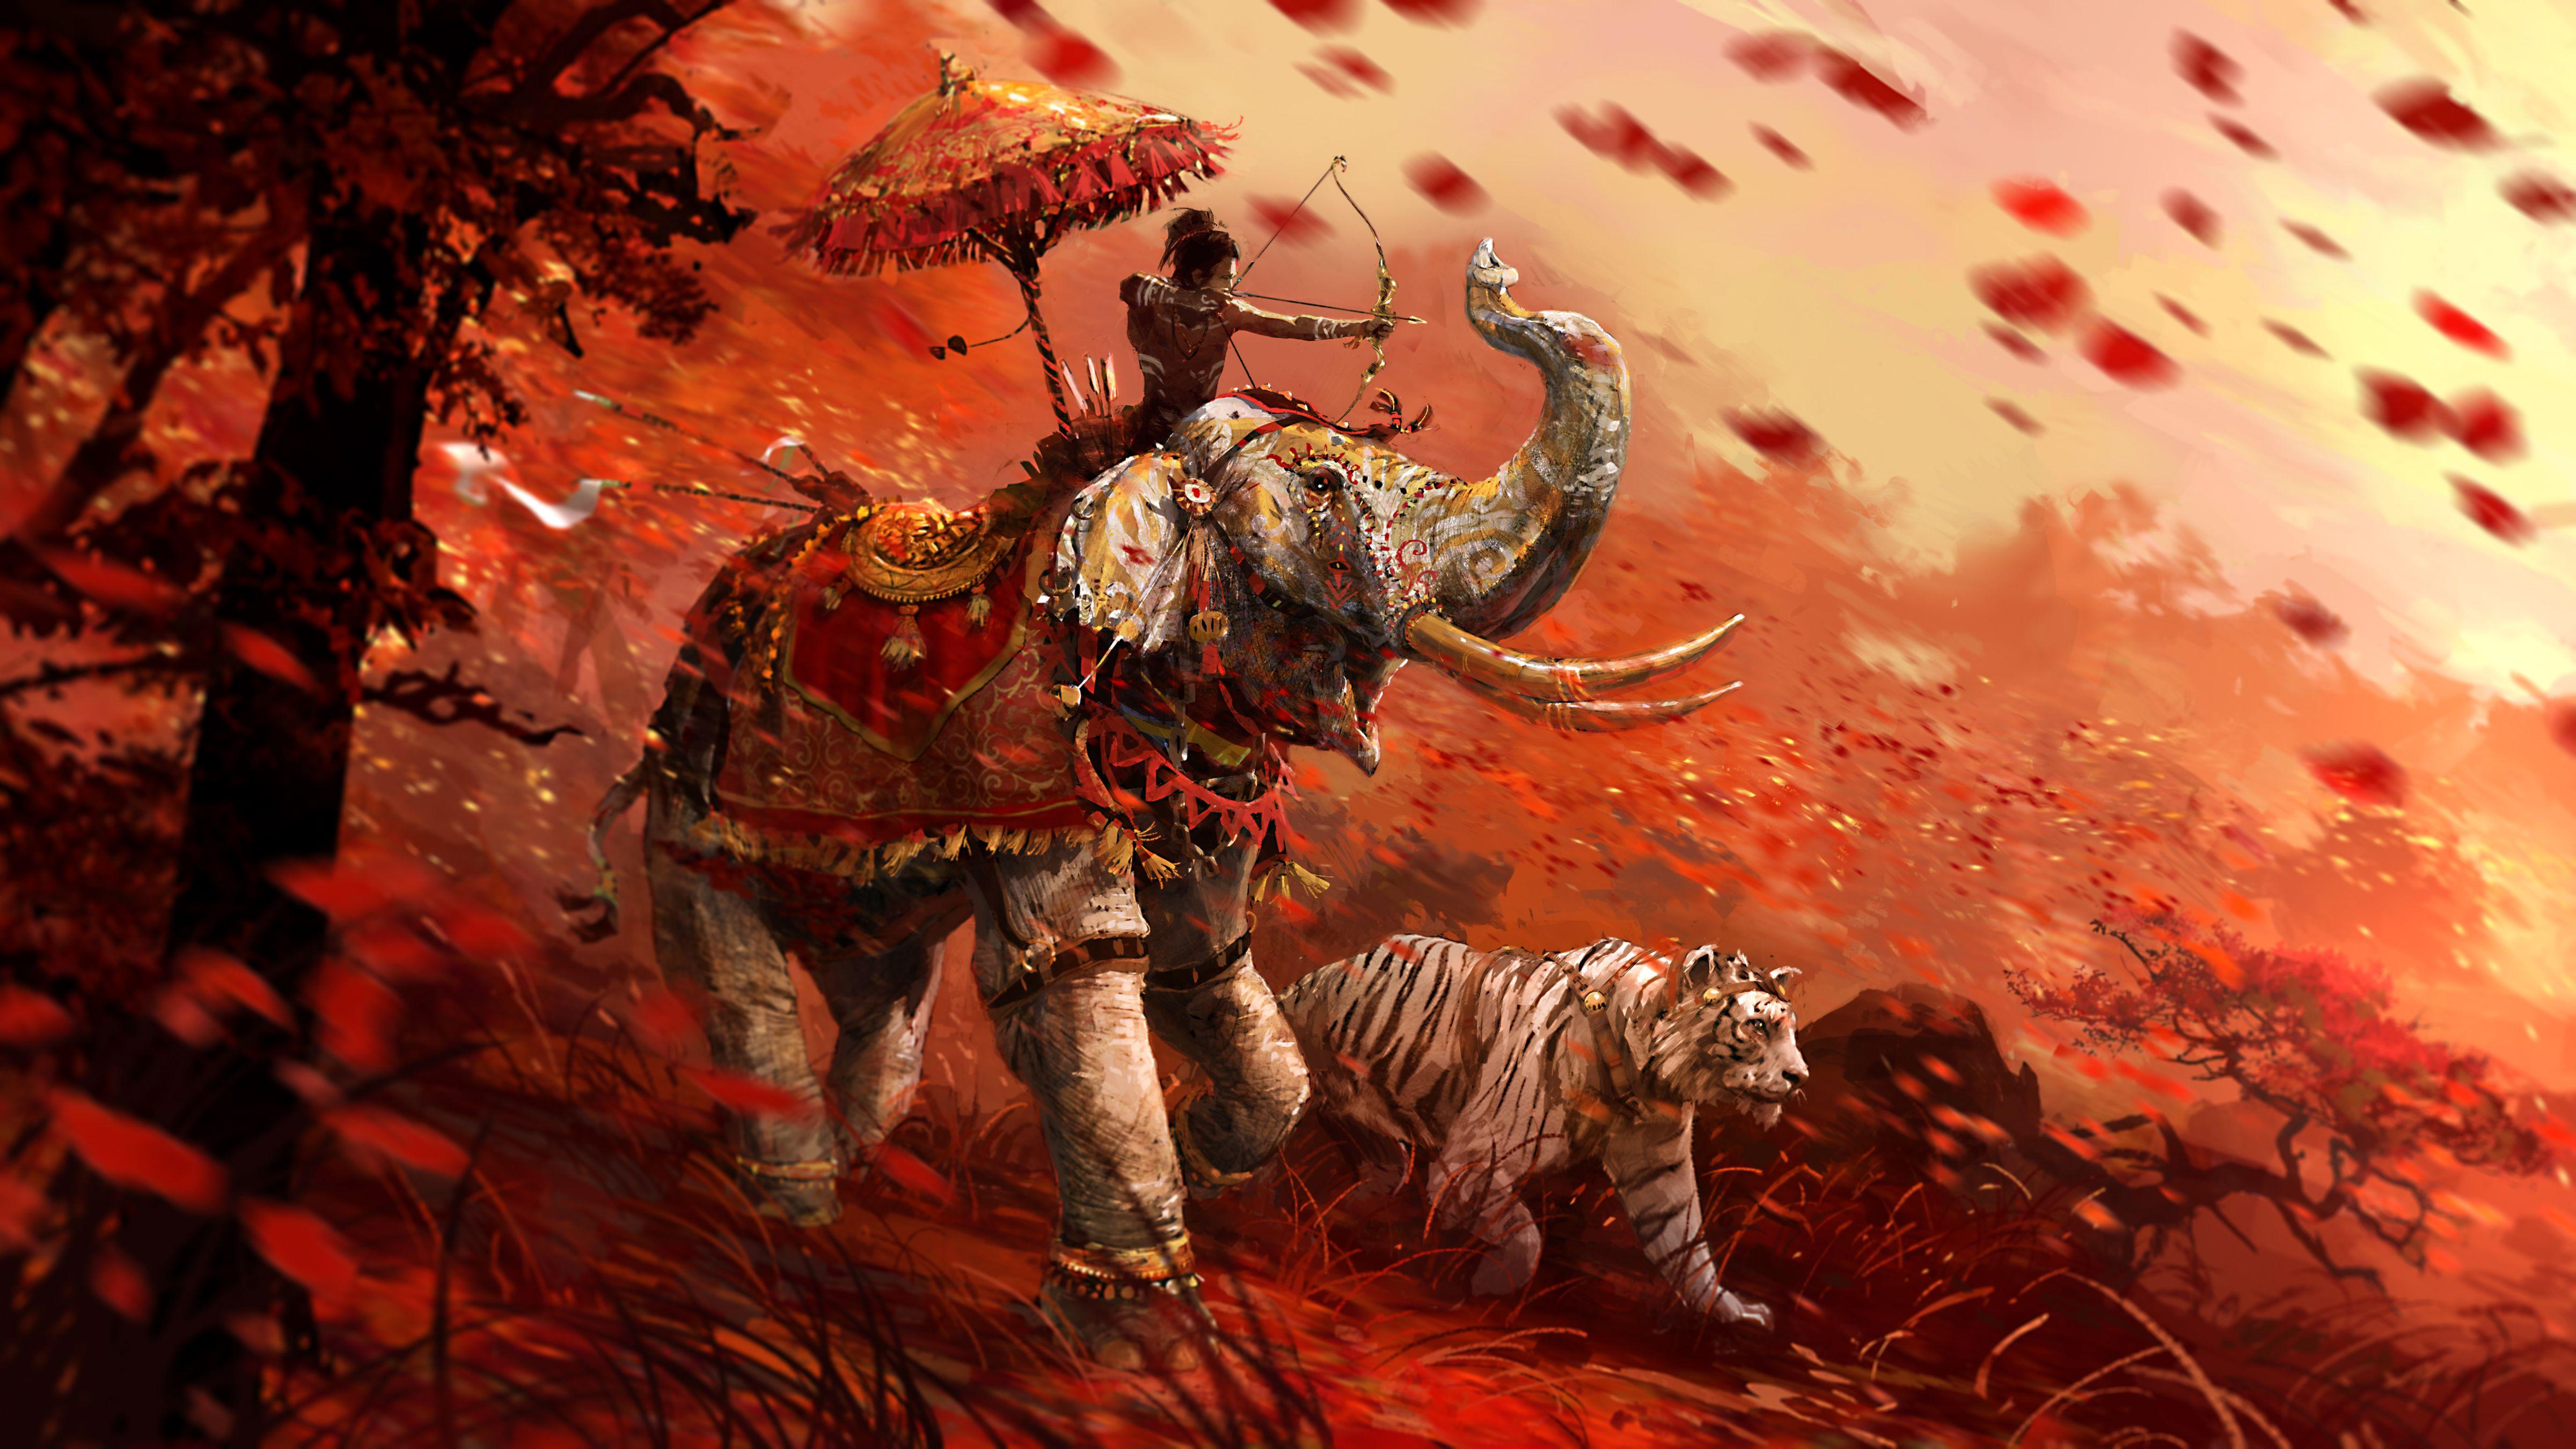 Far Cry 4 Wallpaper Elephant: Video Game Far Cry 4 Far Cry Tiger Elephant Wallpaper